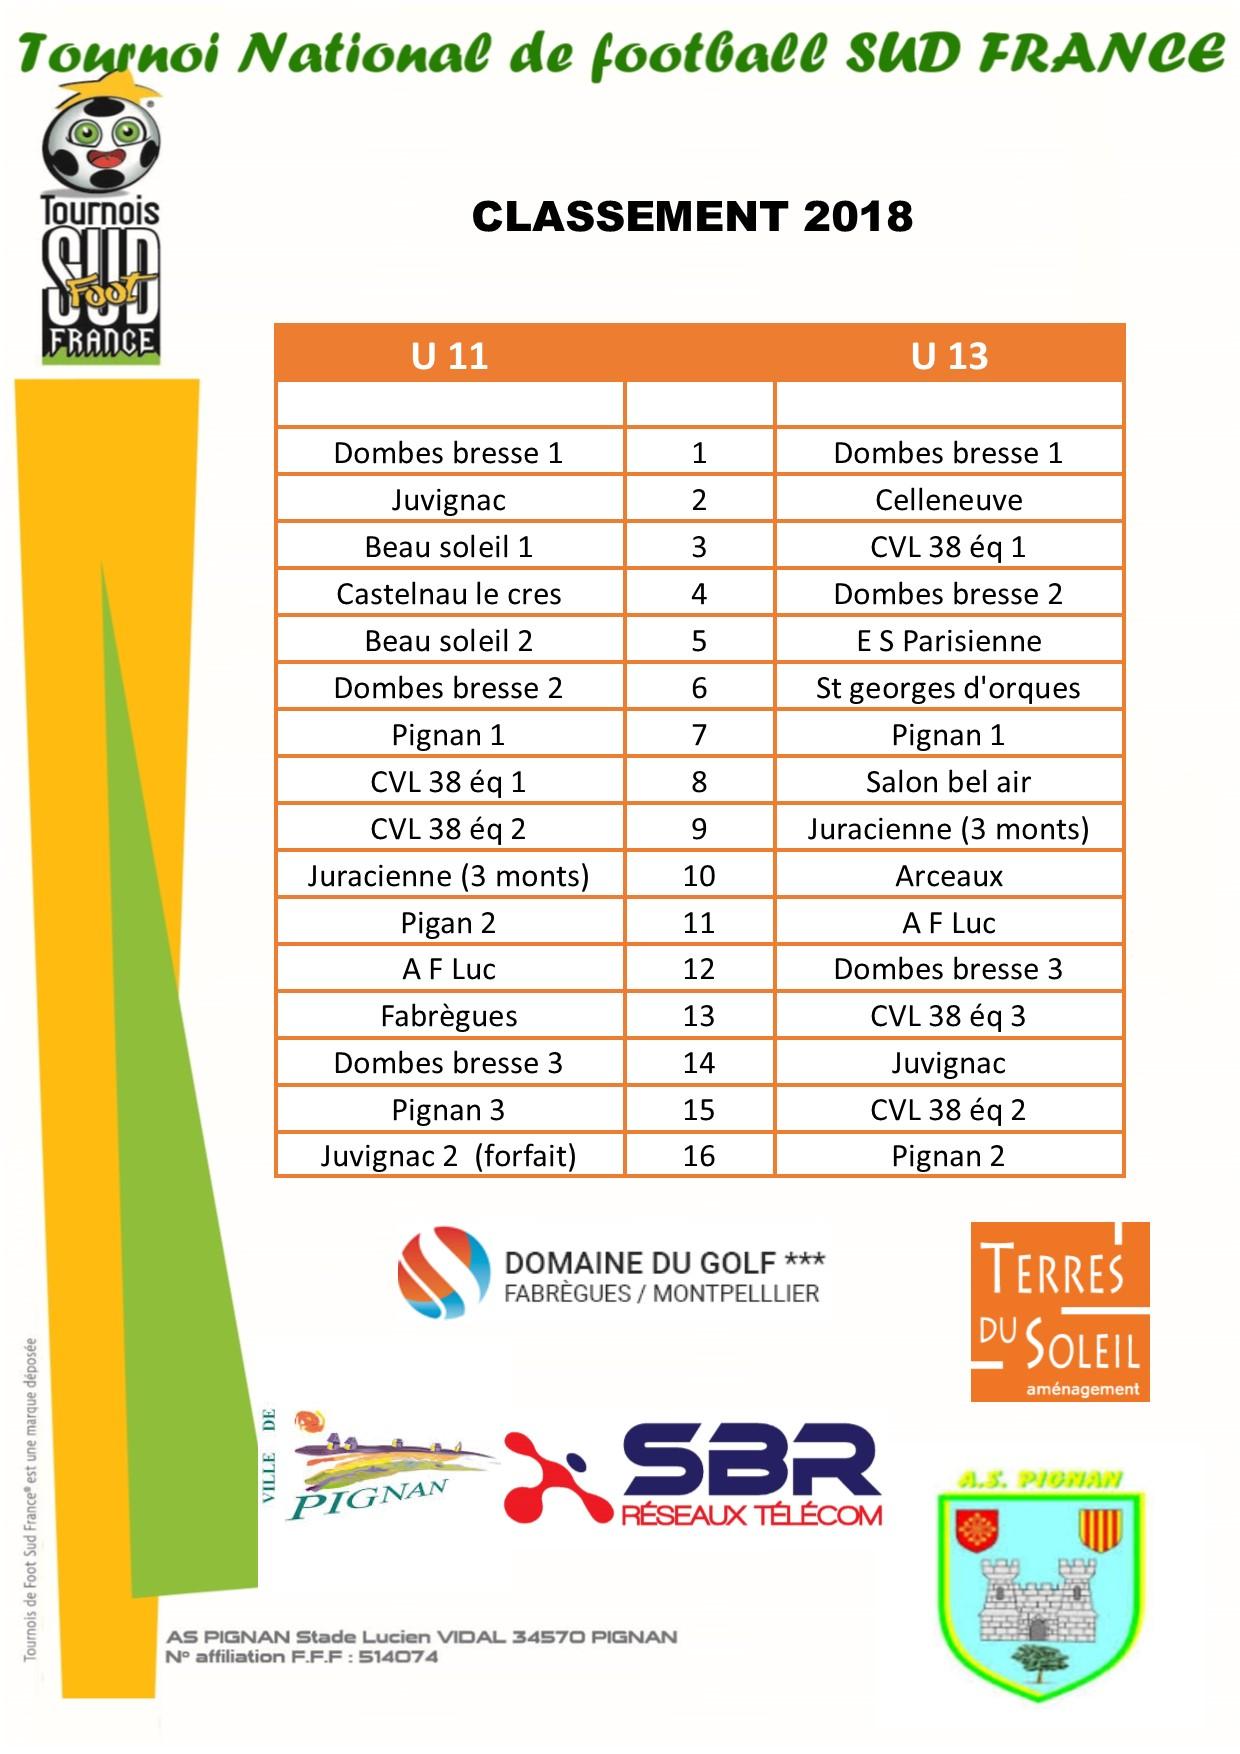 classement 2018 tournoi National SUD FRANCE AS PIGNAN.jpg